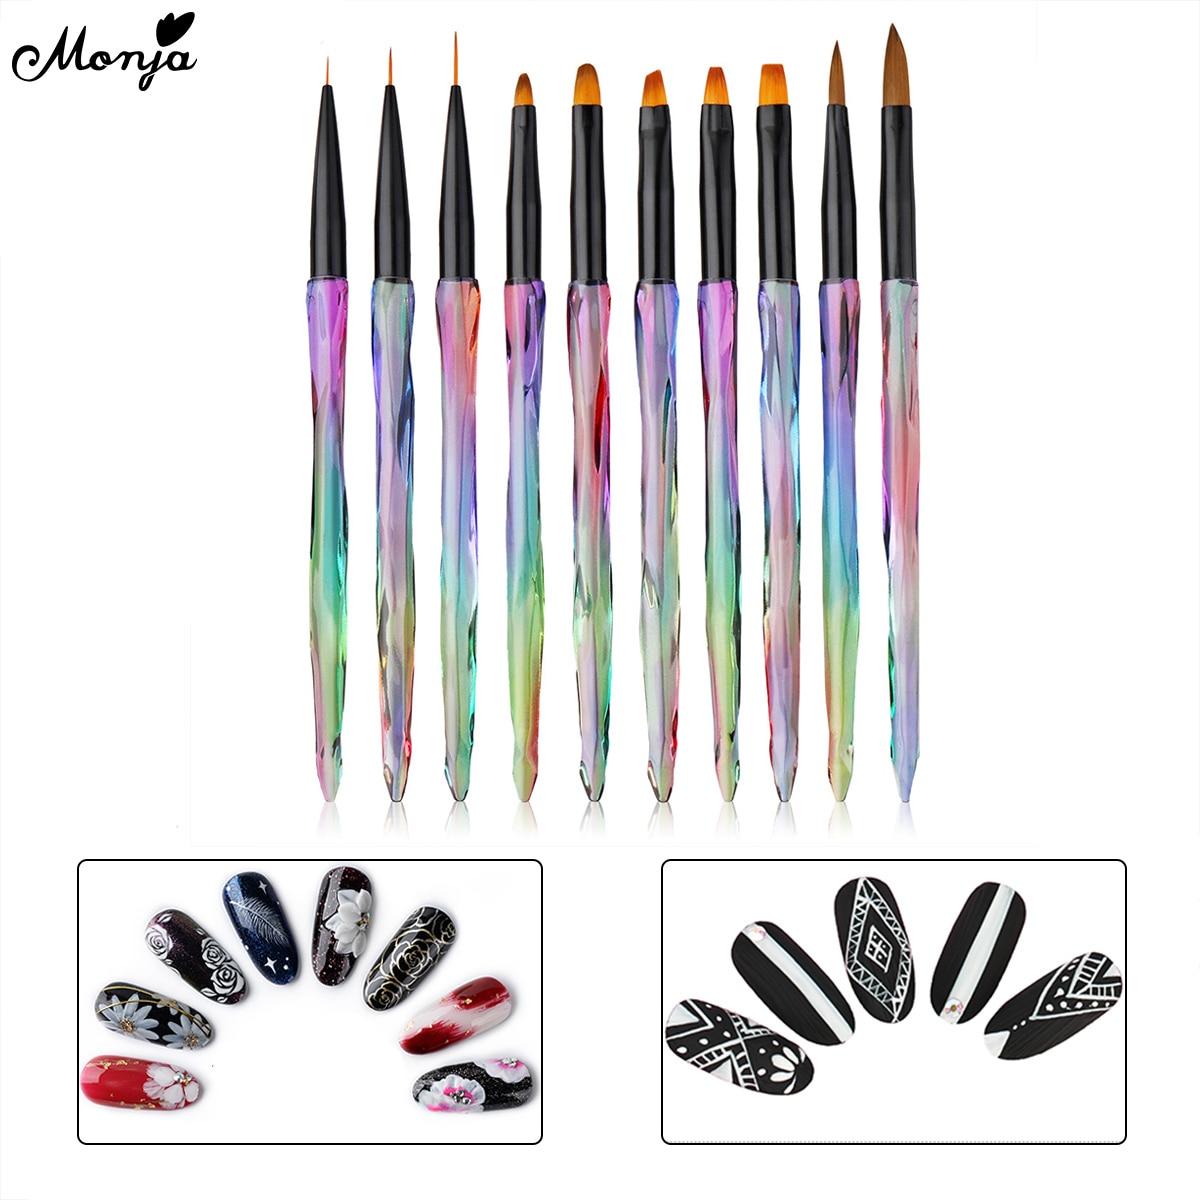 Monja 10Pcs Colorful Handle Nail Art Stripe Lines Painting Brush UV GEL Extension Builder Acrylic Liquid Powder Carving Pen